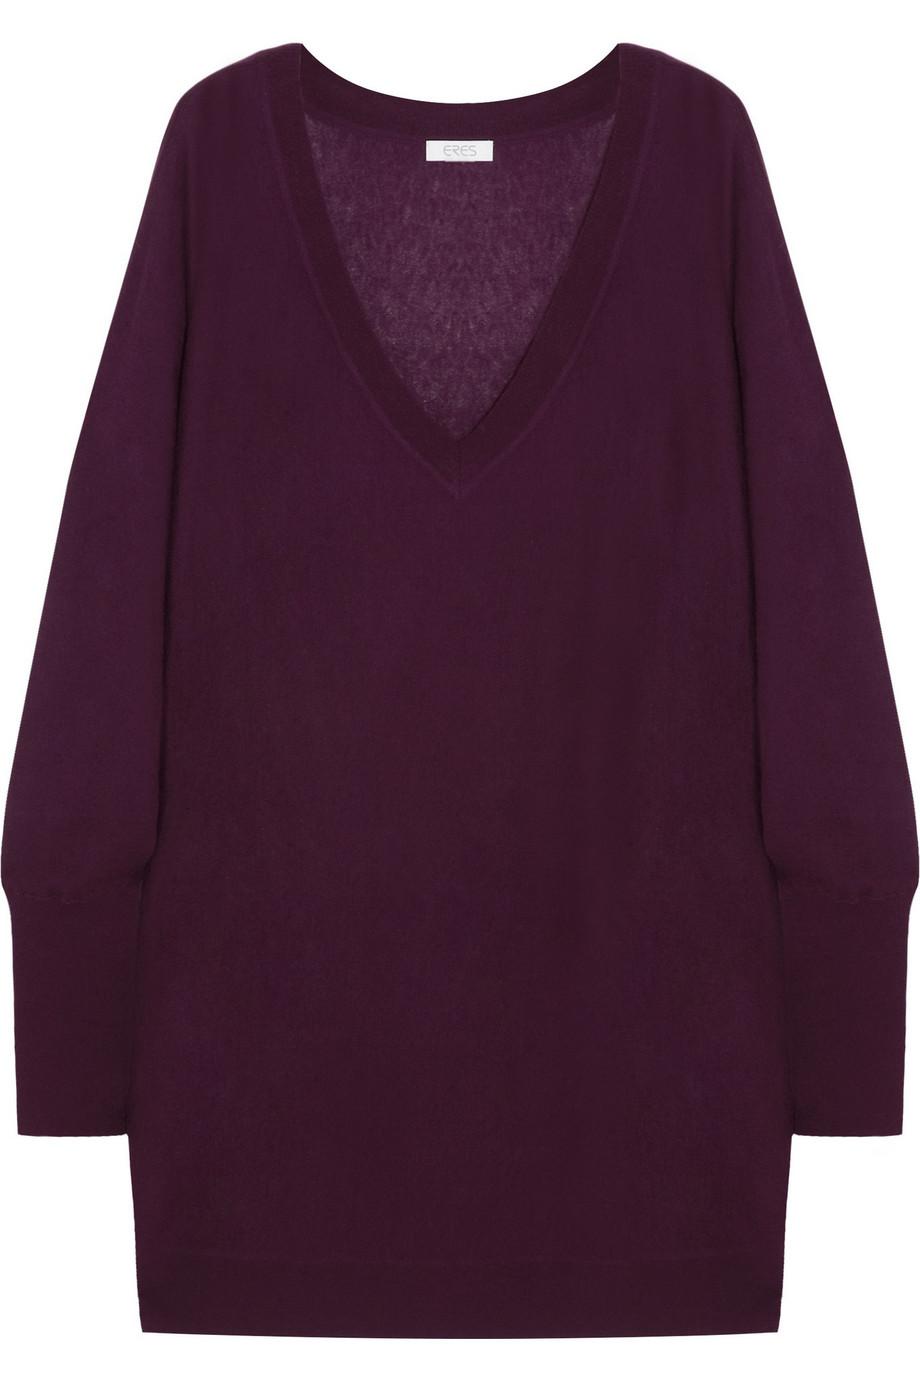 Eres Futile Anonyme Cashmere Sweater, Size: 1